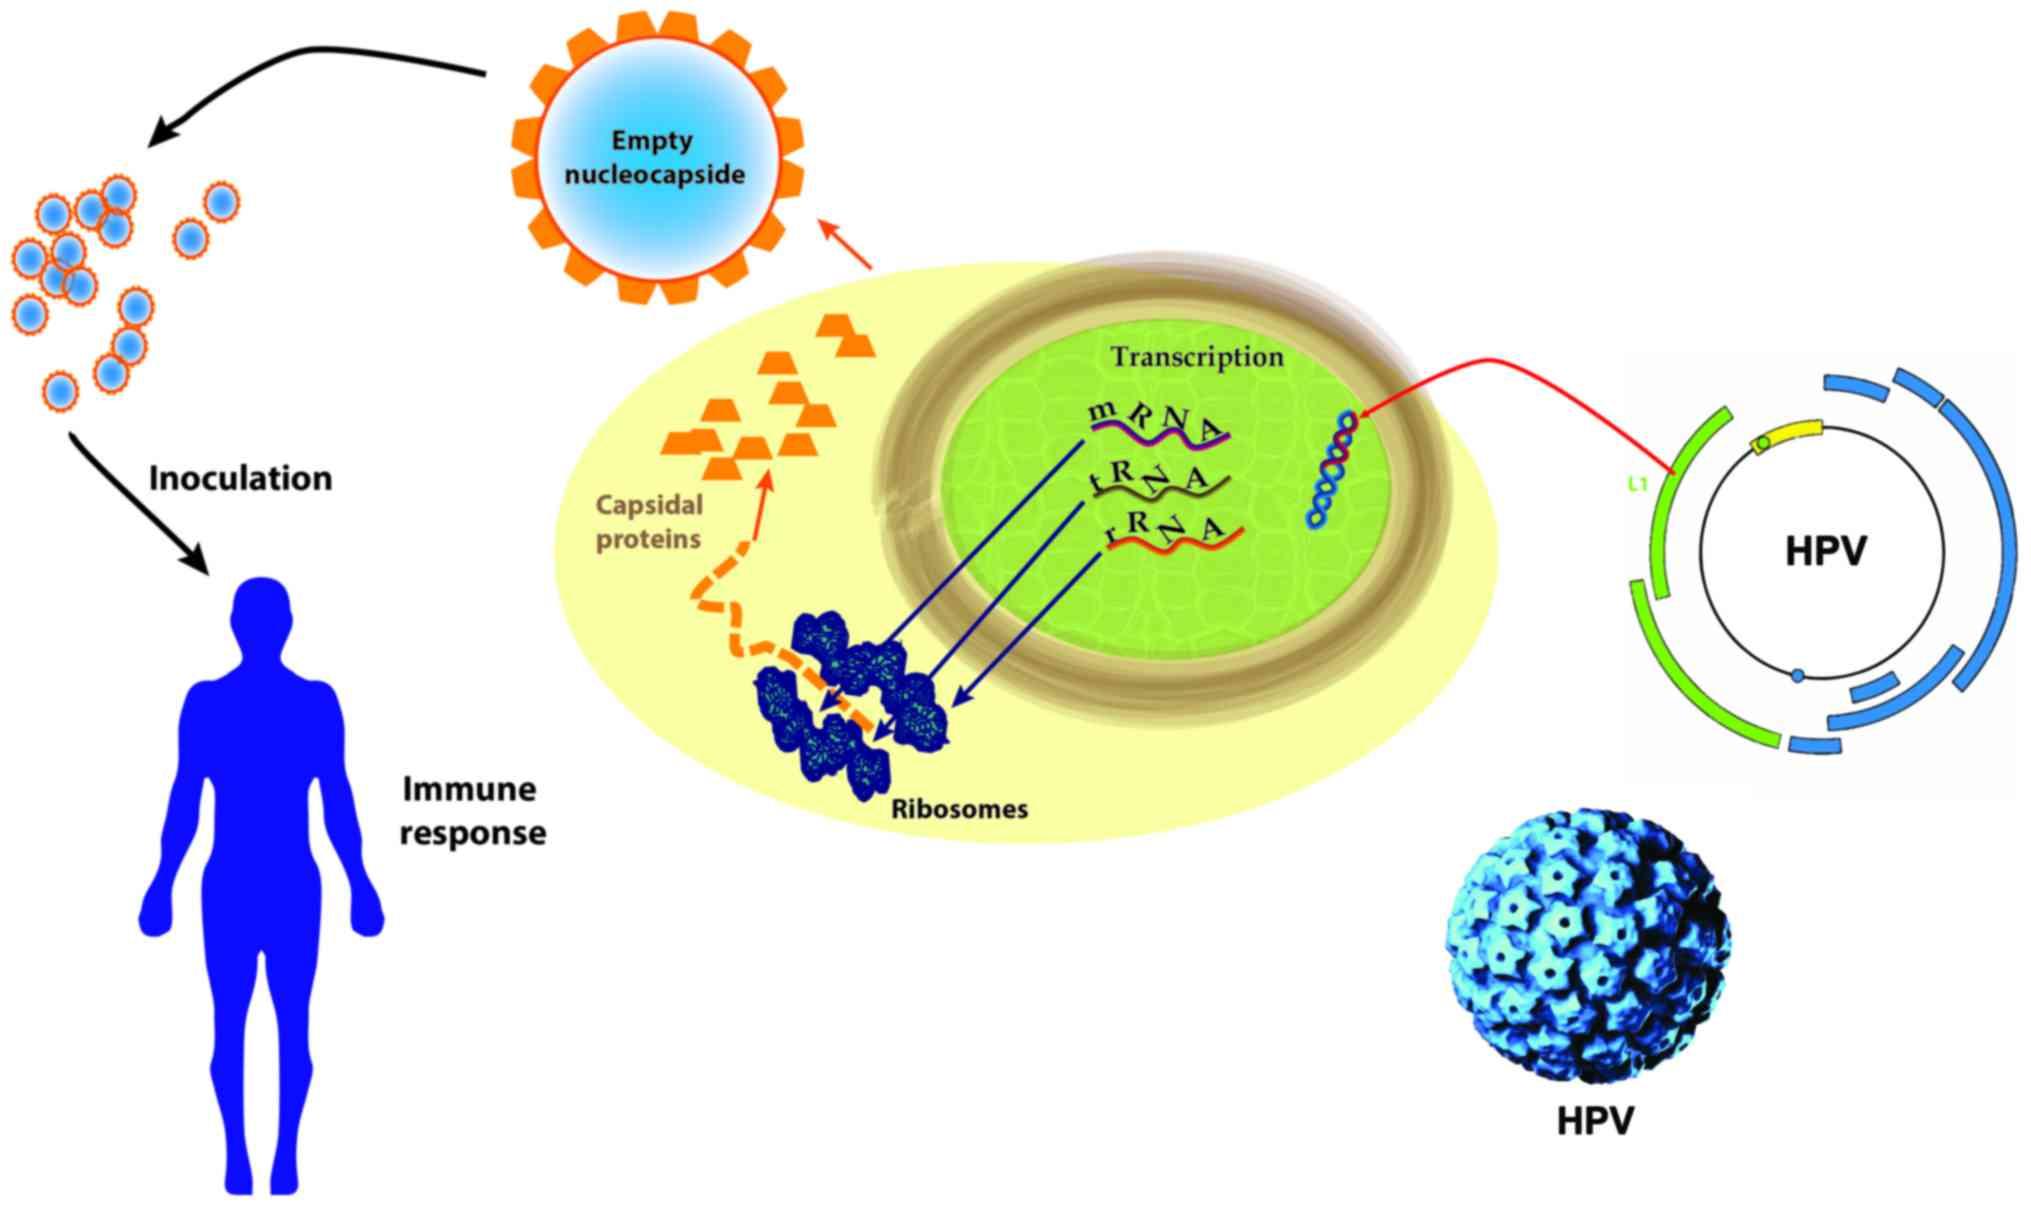 human papillomavirus (hpv) especially strains 16 and 18